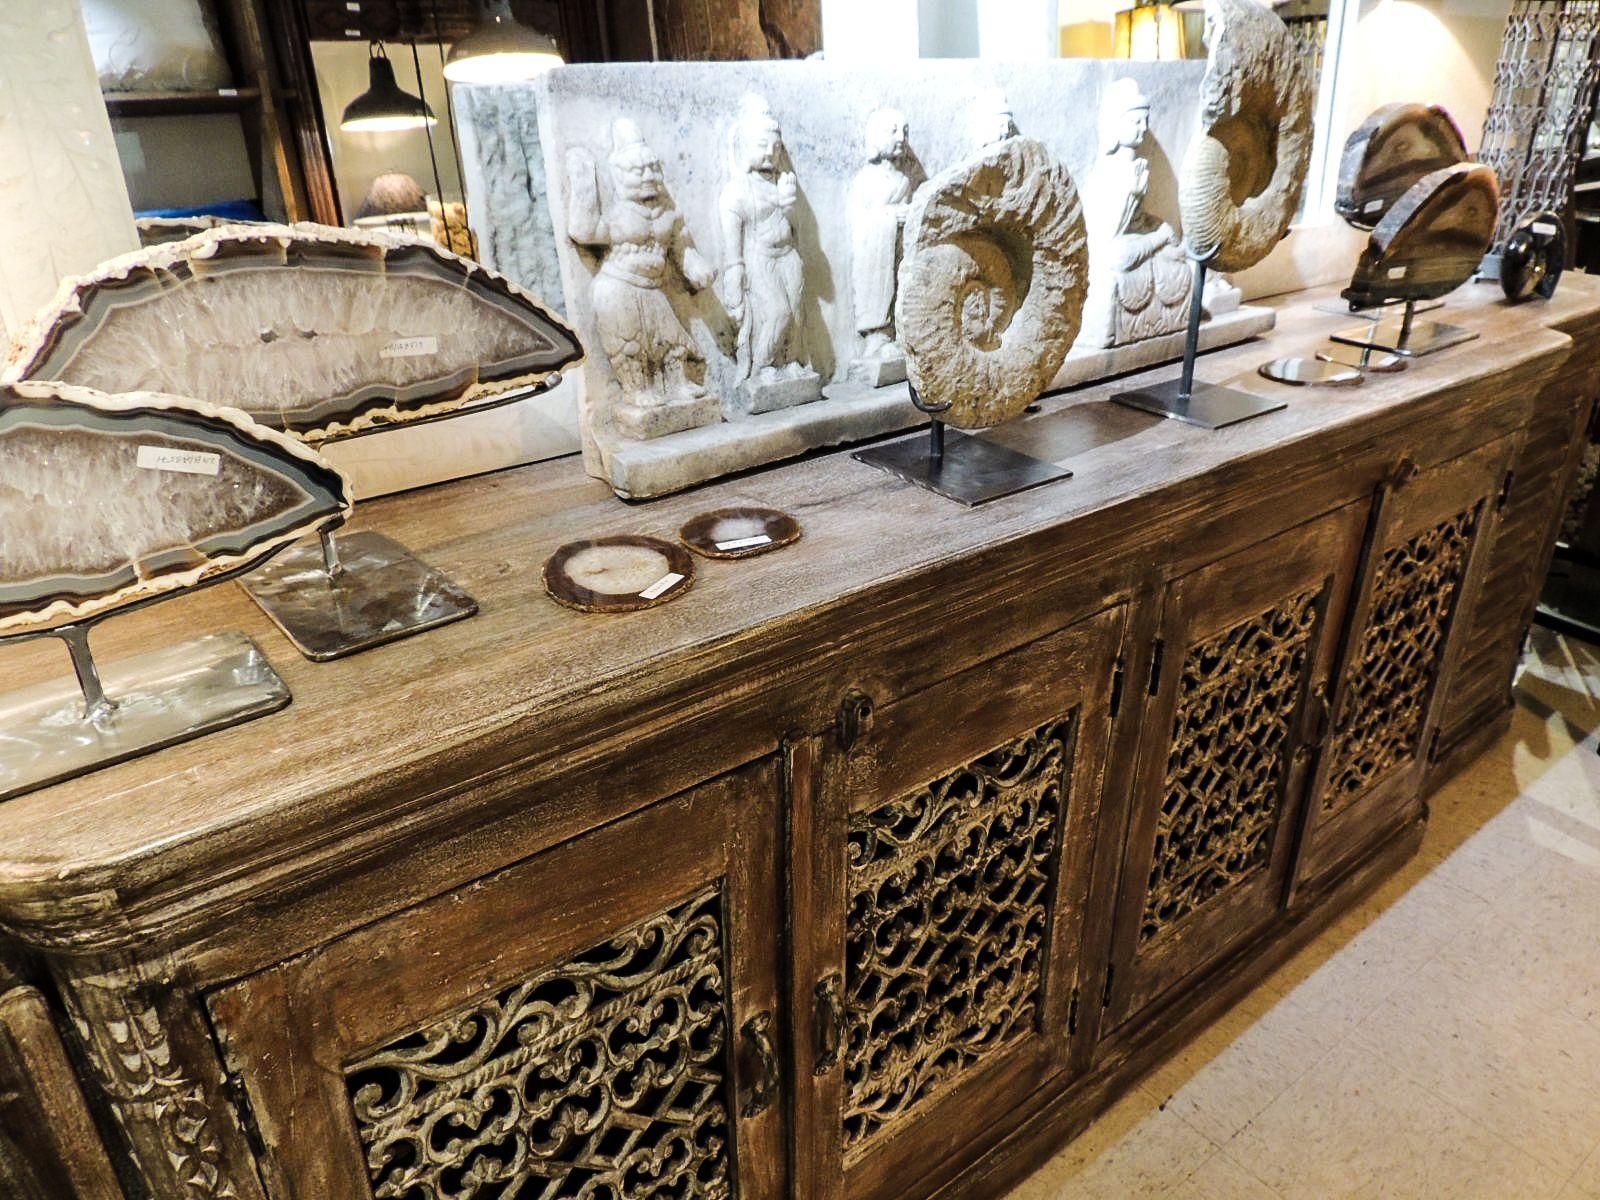 Buffet Display W/ Agate U0026 Stone Sculptures. #buffet #buffets #cabinets #